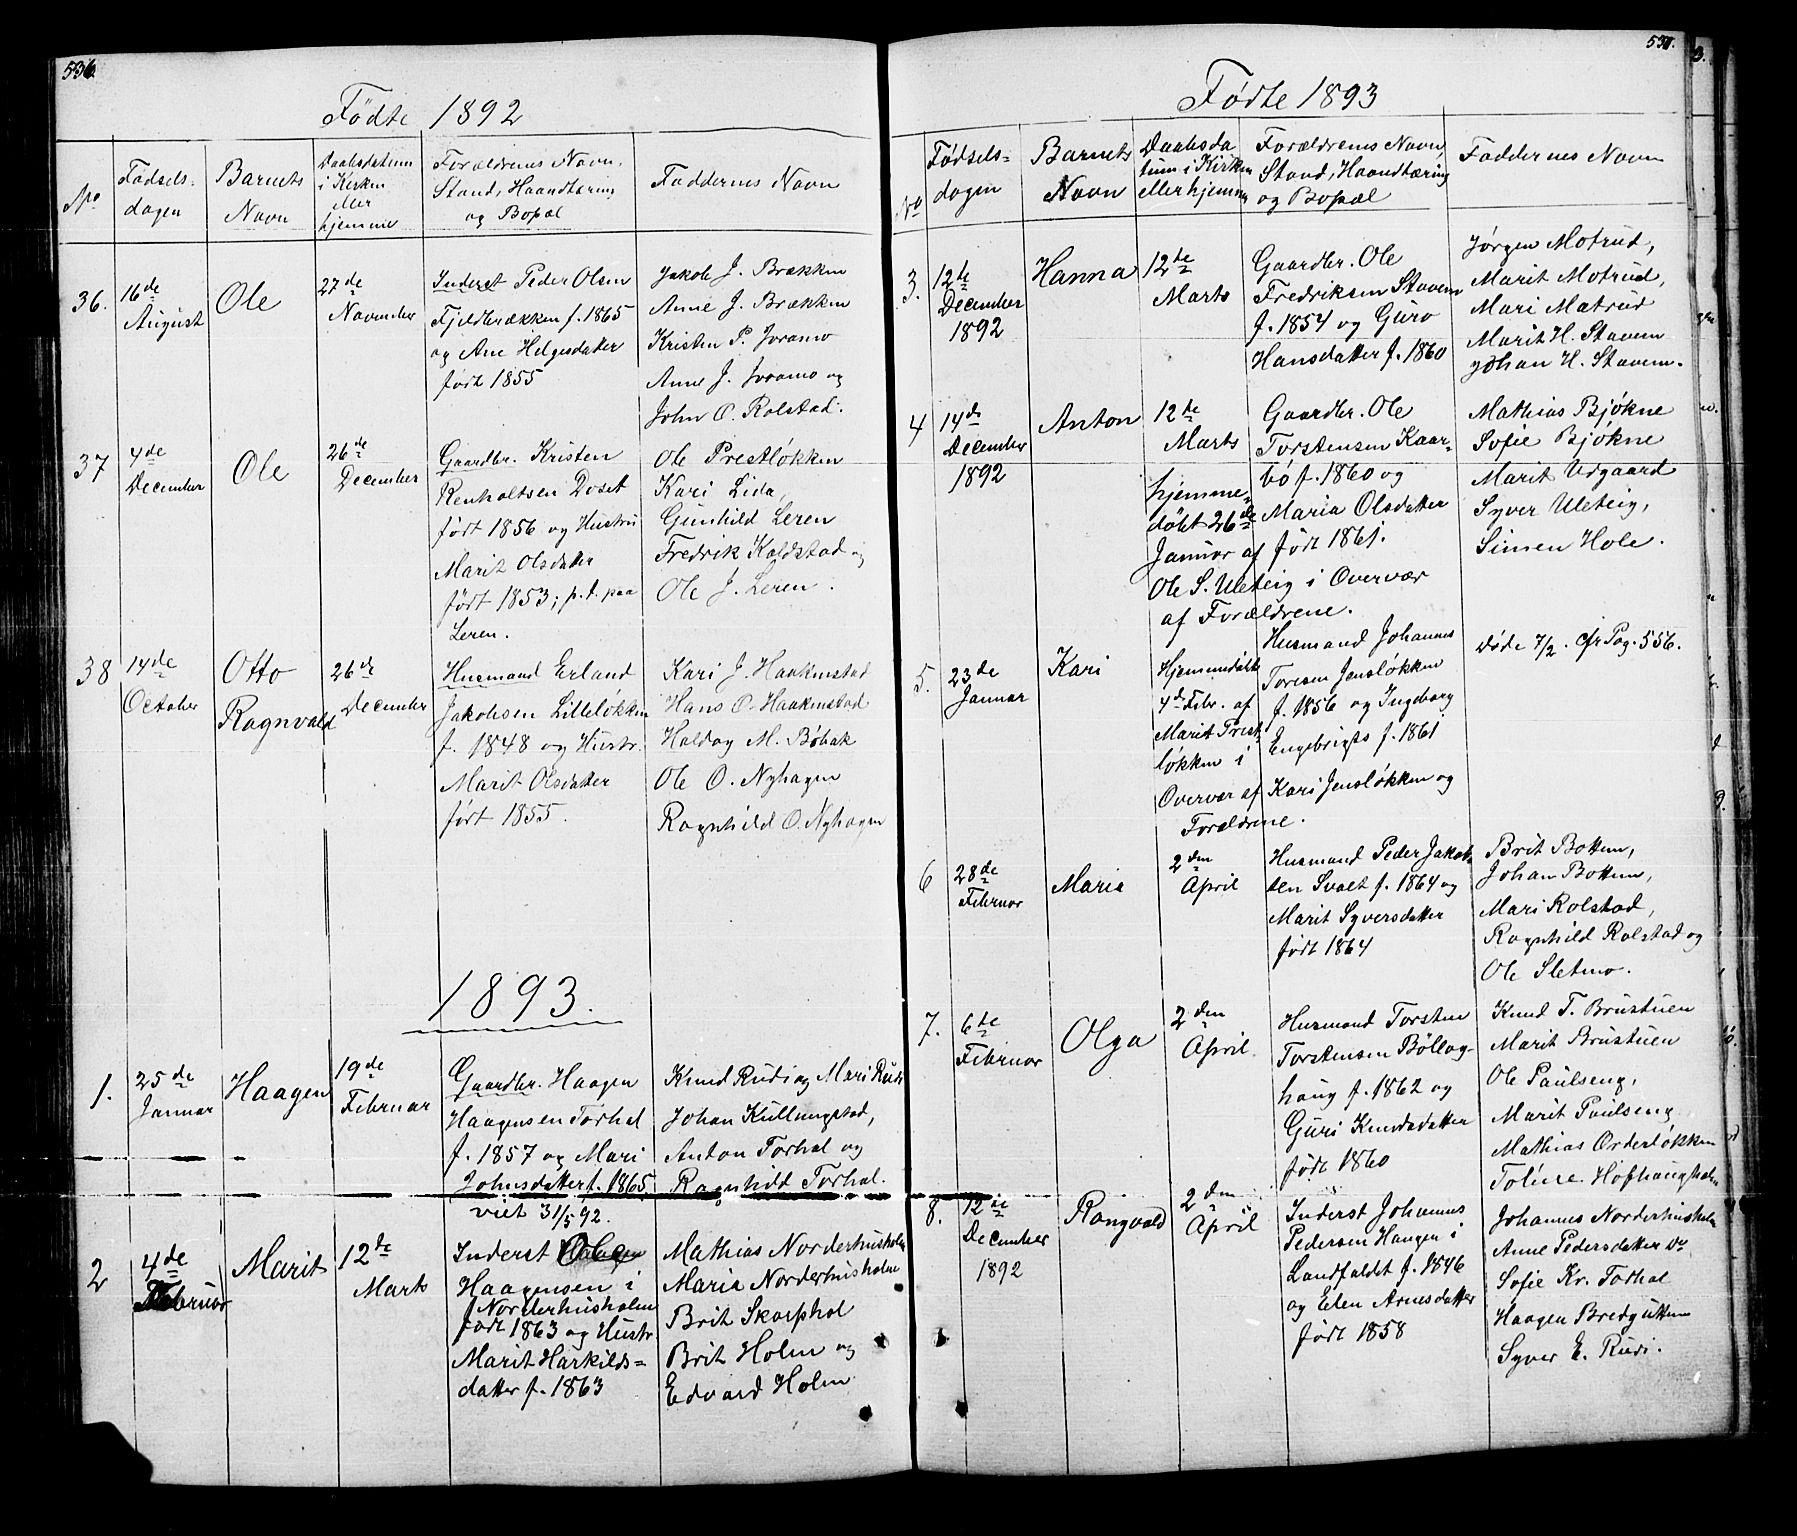 SAH, Lesja prestekontor, Klokkerbok nr. 5, 1850-1894, s. 536-537